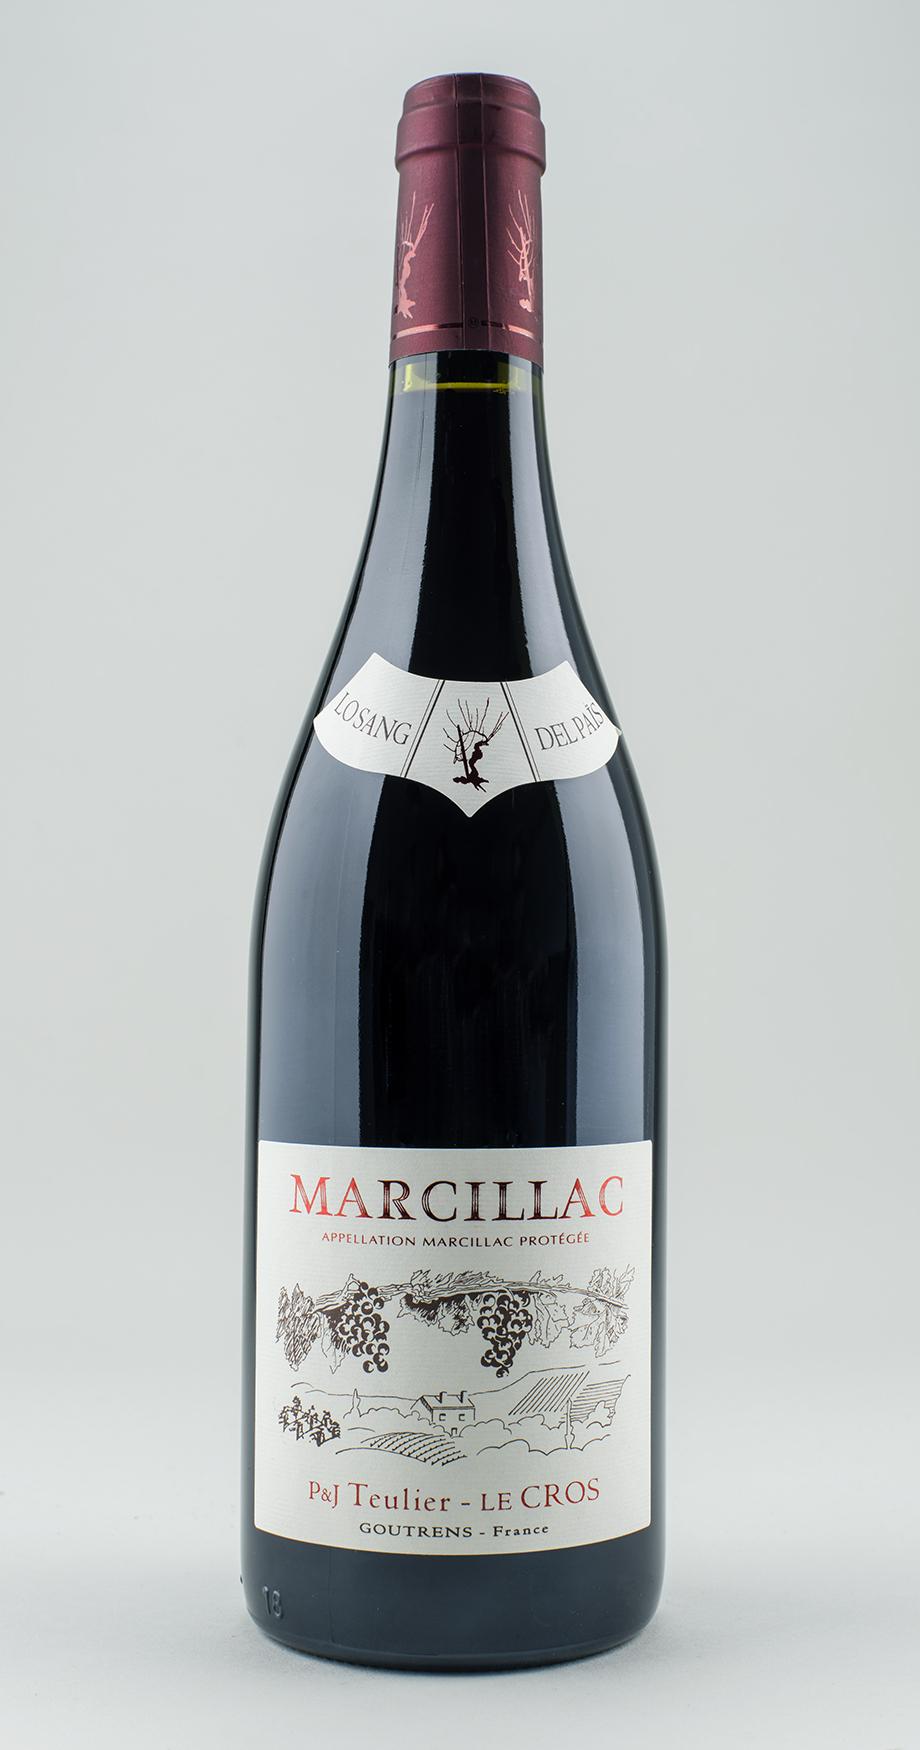 MarcillacRouge